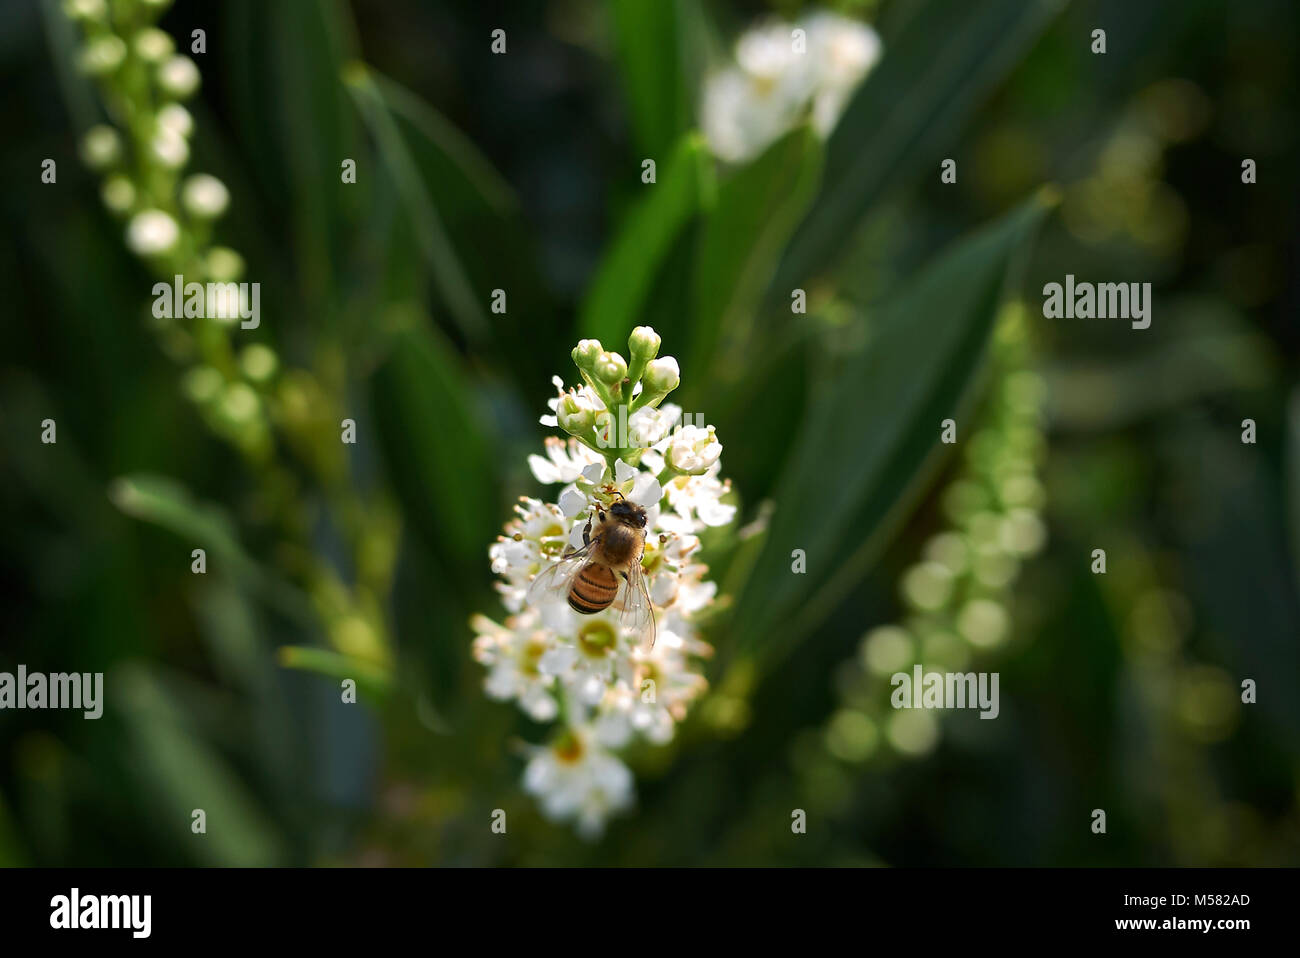 Prunus laurocerasus - Stock Image